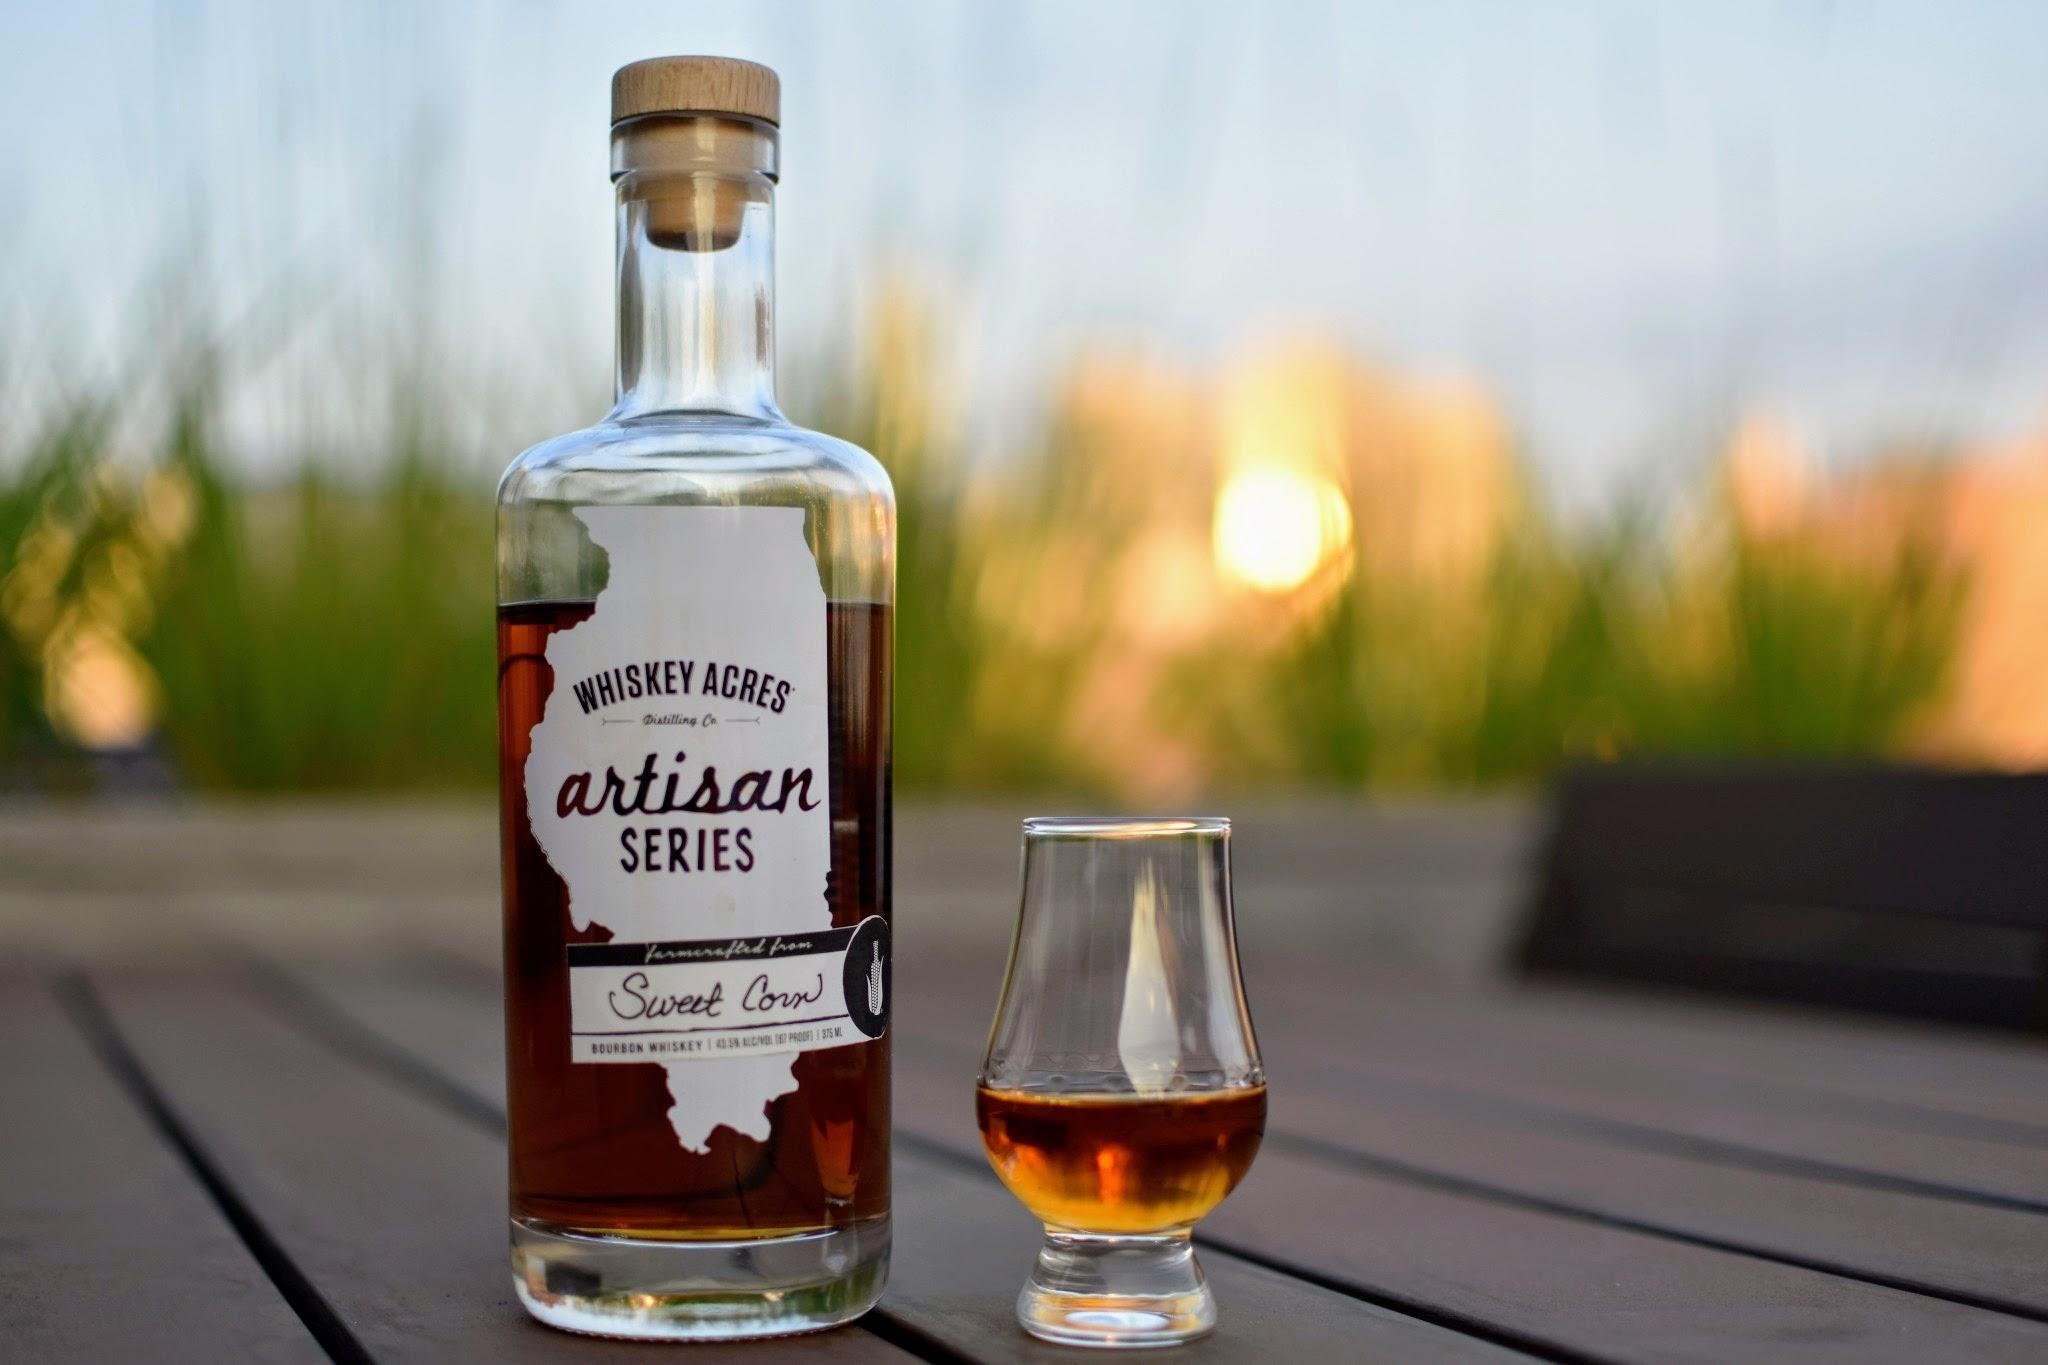 Whiskey Acres To Release Second Artisan Series Bourbon